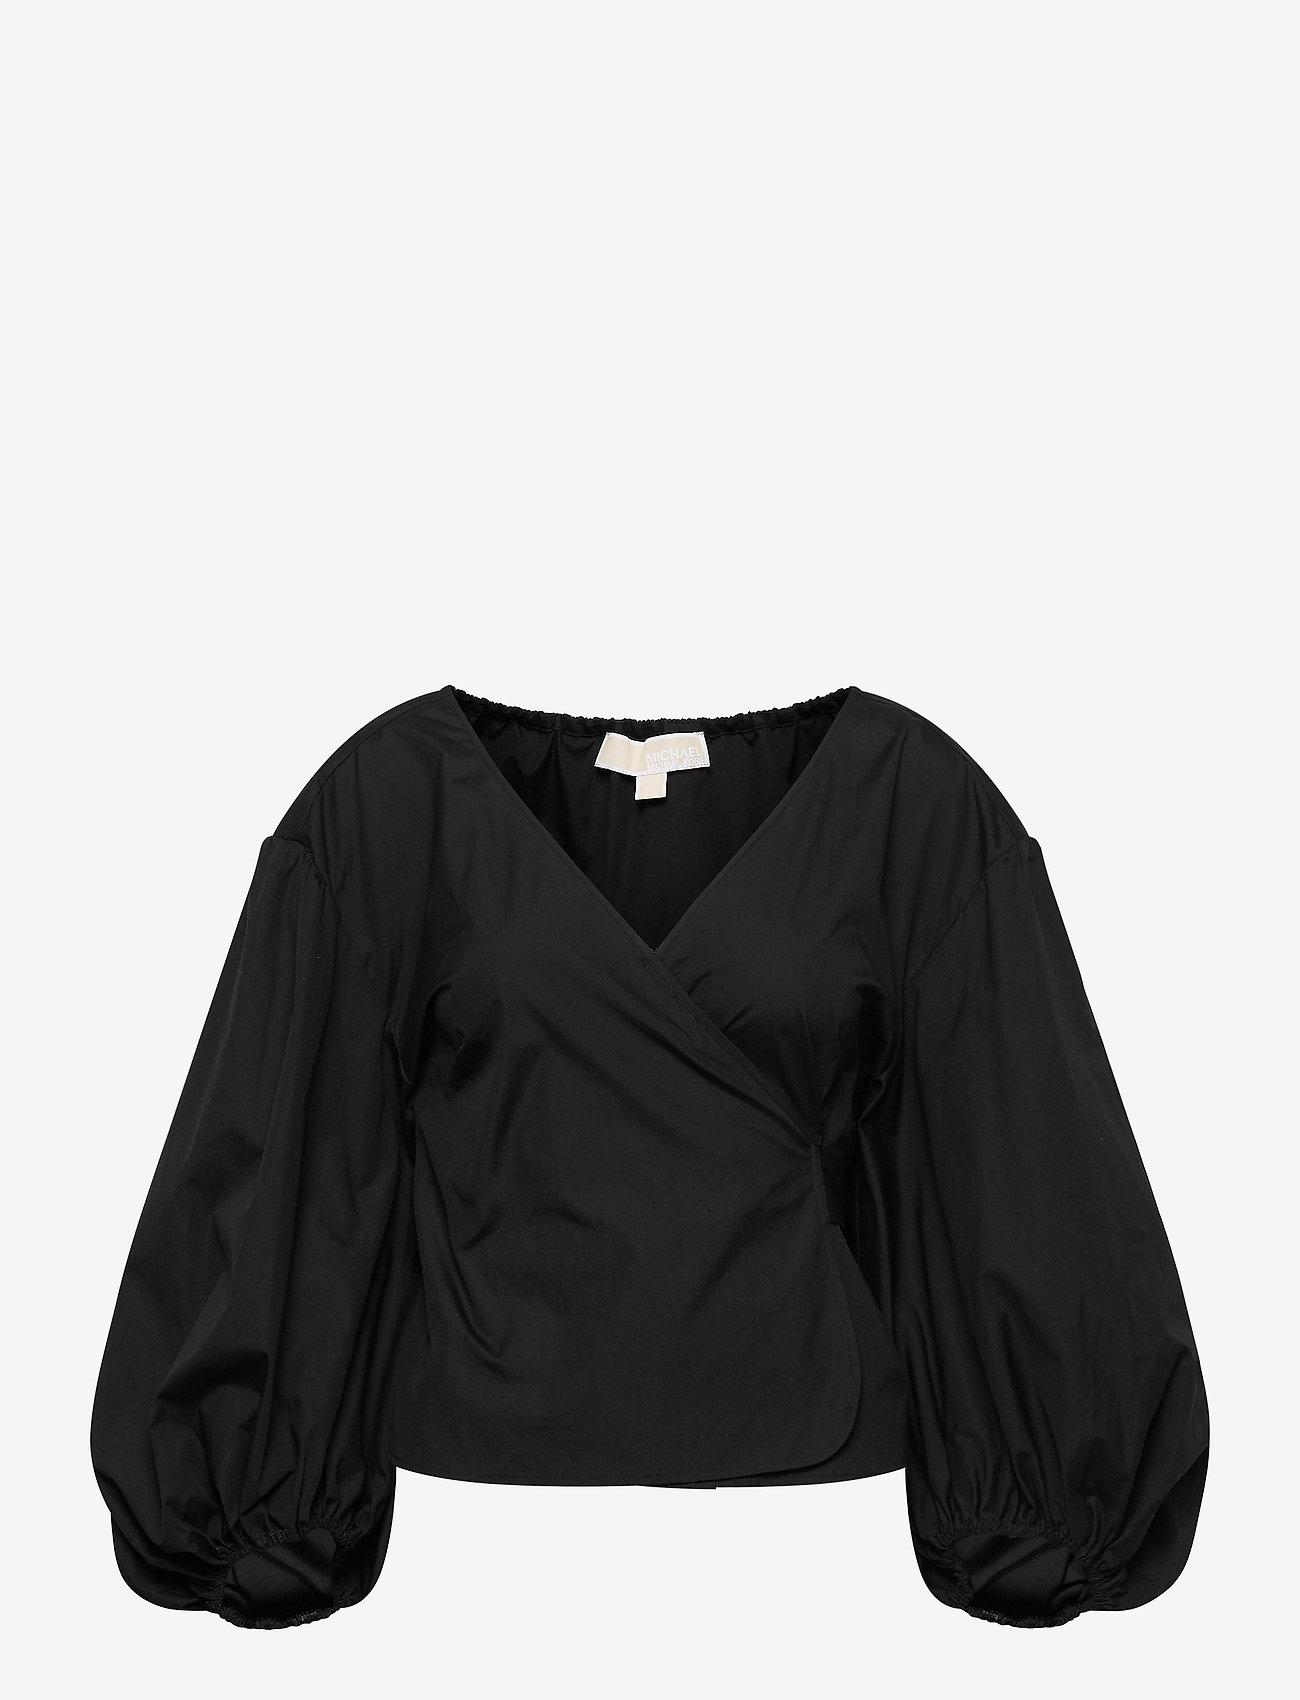 Michael Kors - COTTON POPLIN WRAP TP - blouses met lange mouwen - black - 0